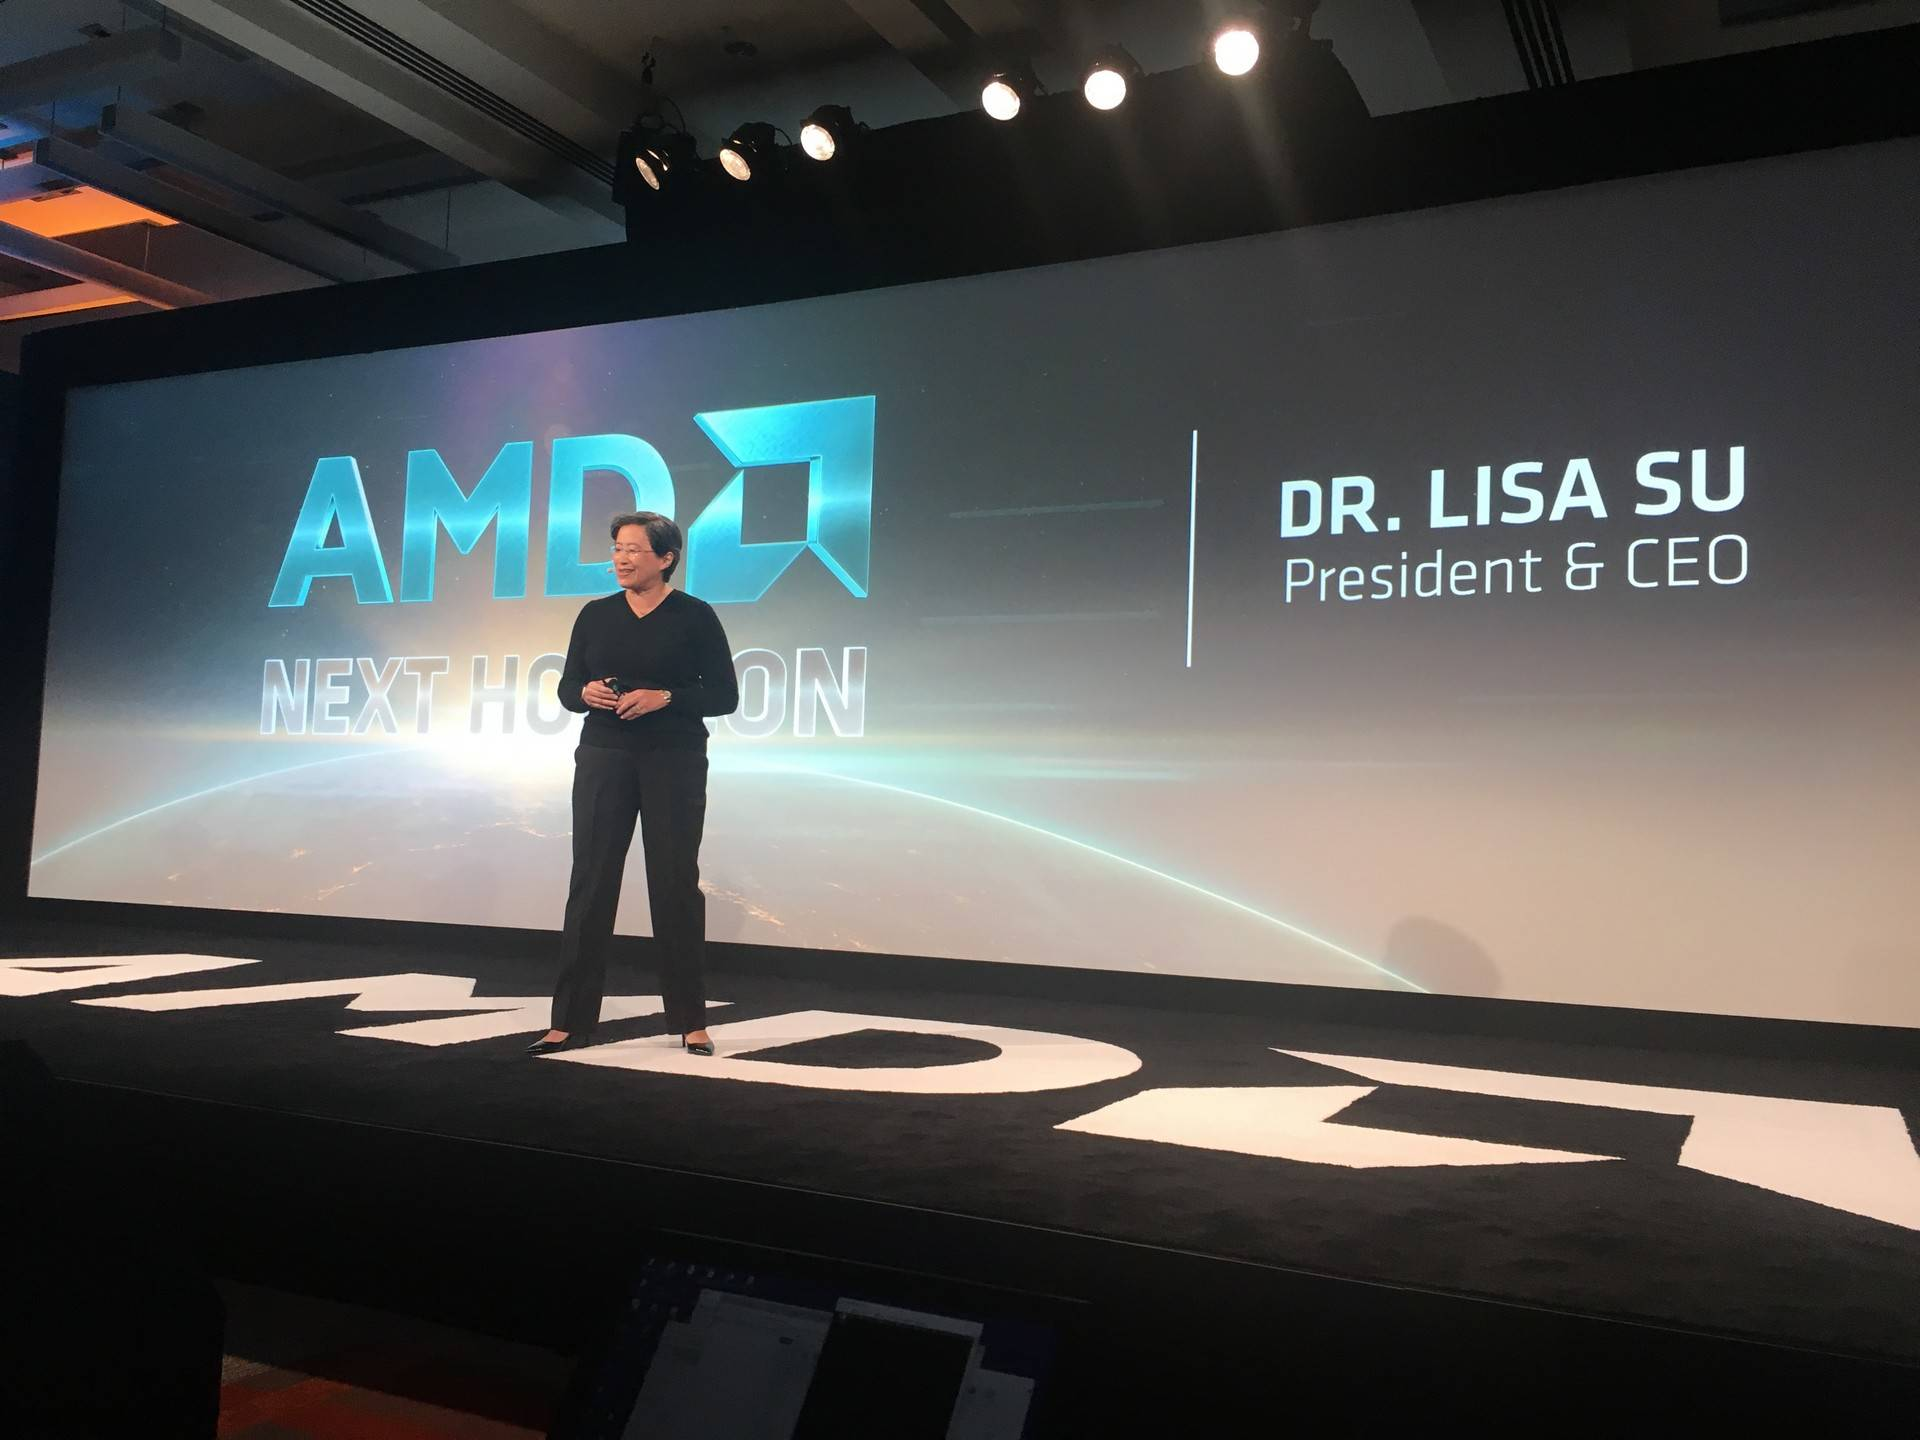 AMD Next Horizon Evento